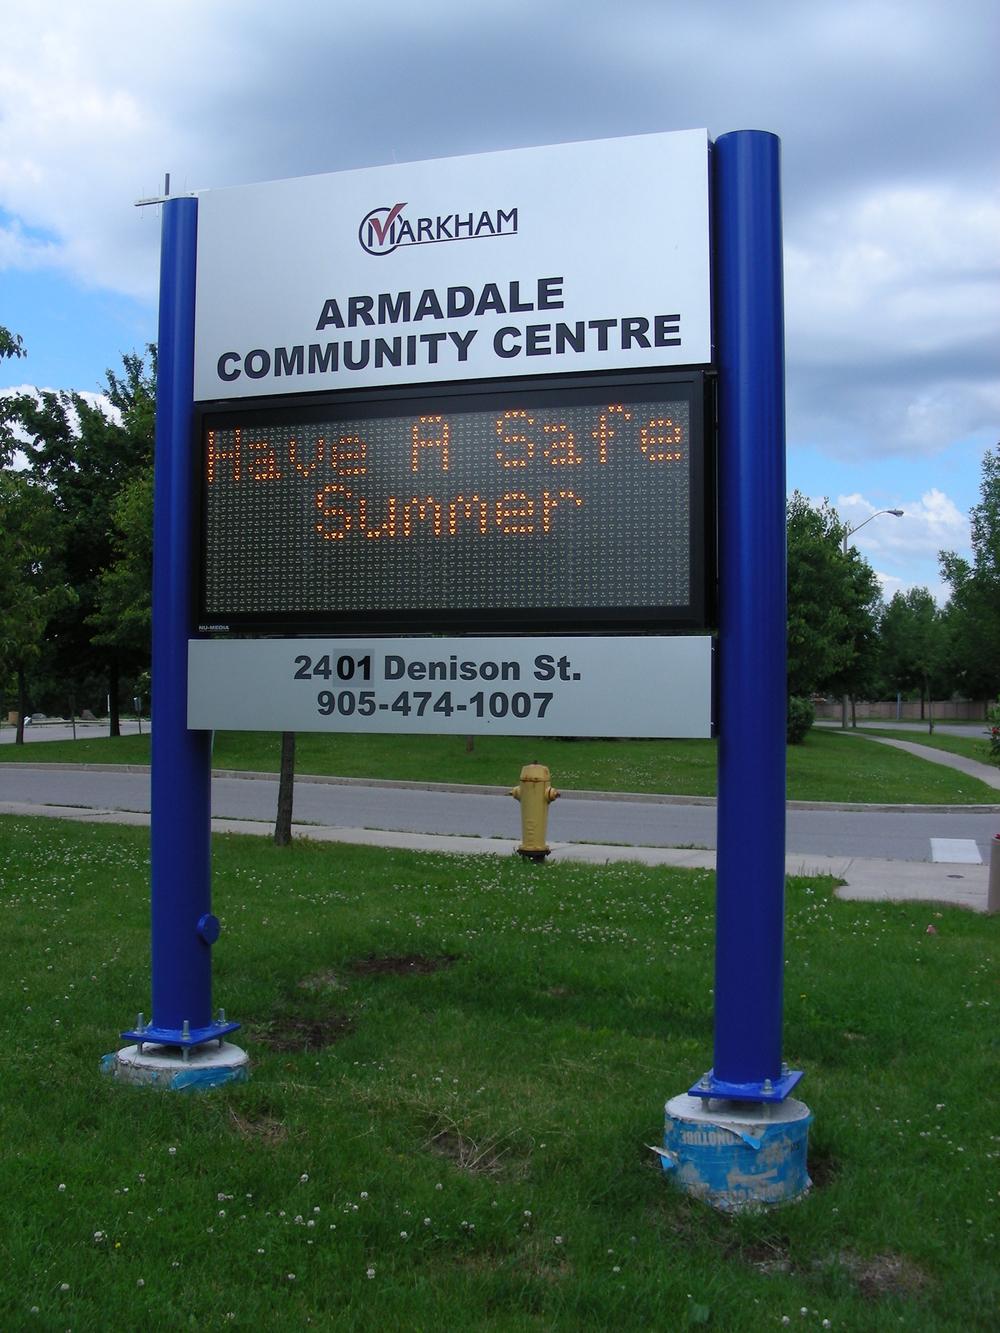 Armadale Community Centre Markham 009.jpg